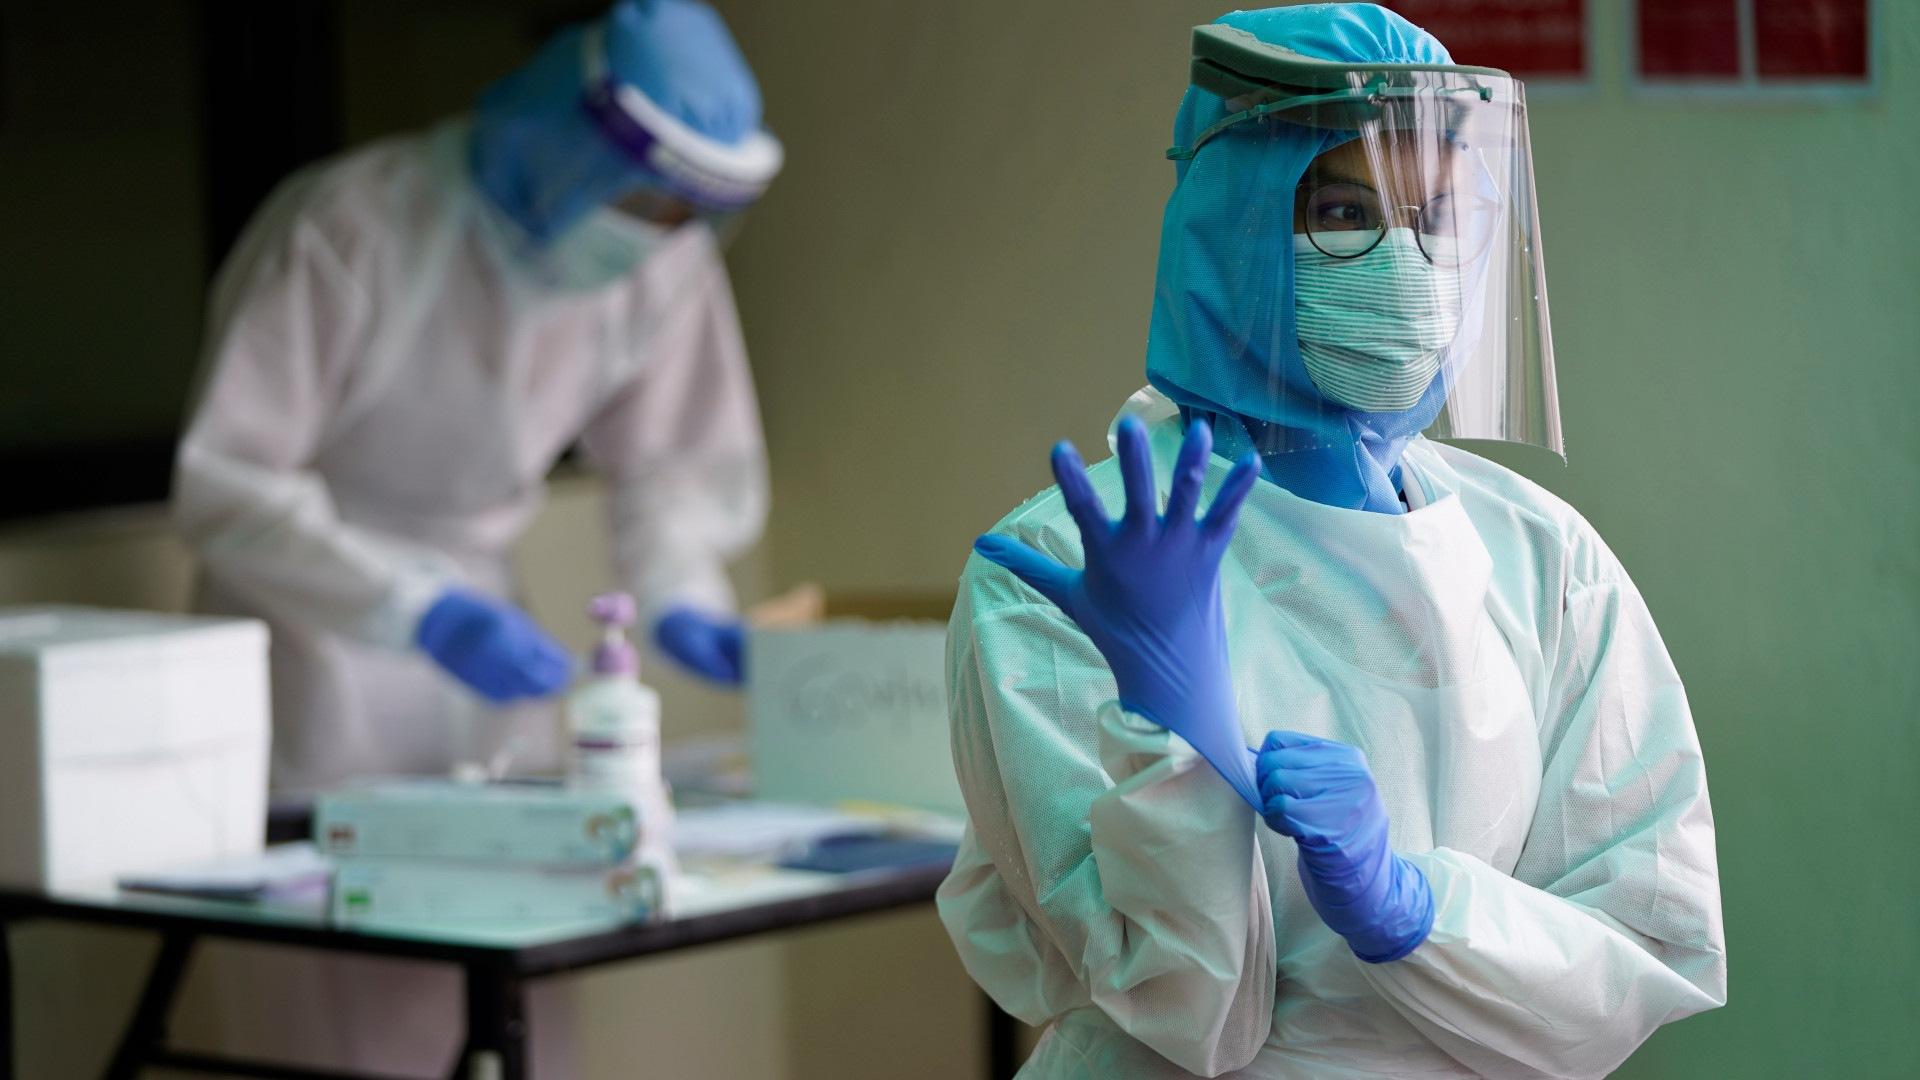 Оперативная статистика по коронавирусу в России на 28 апреля